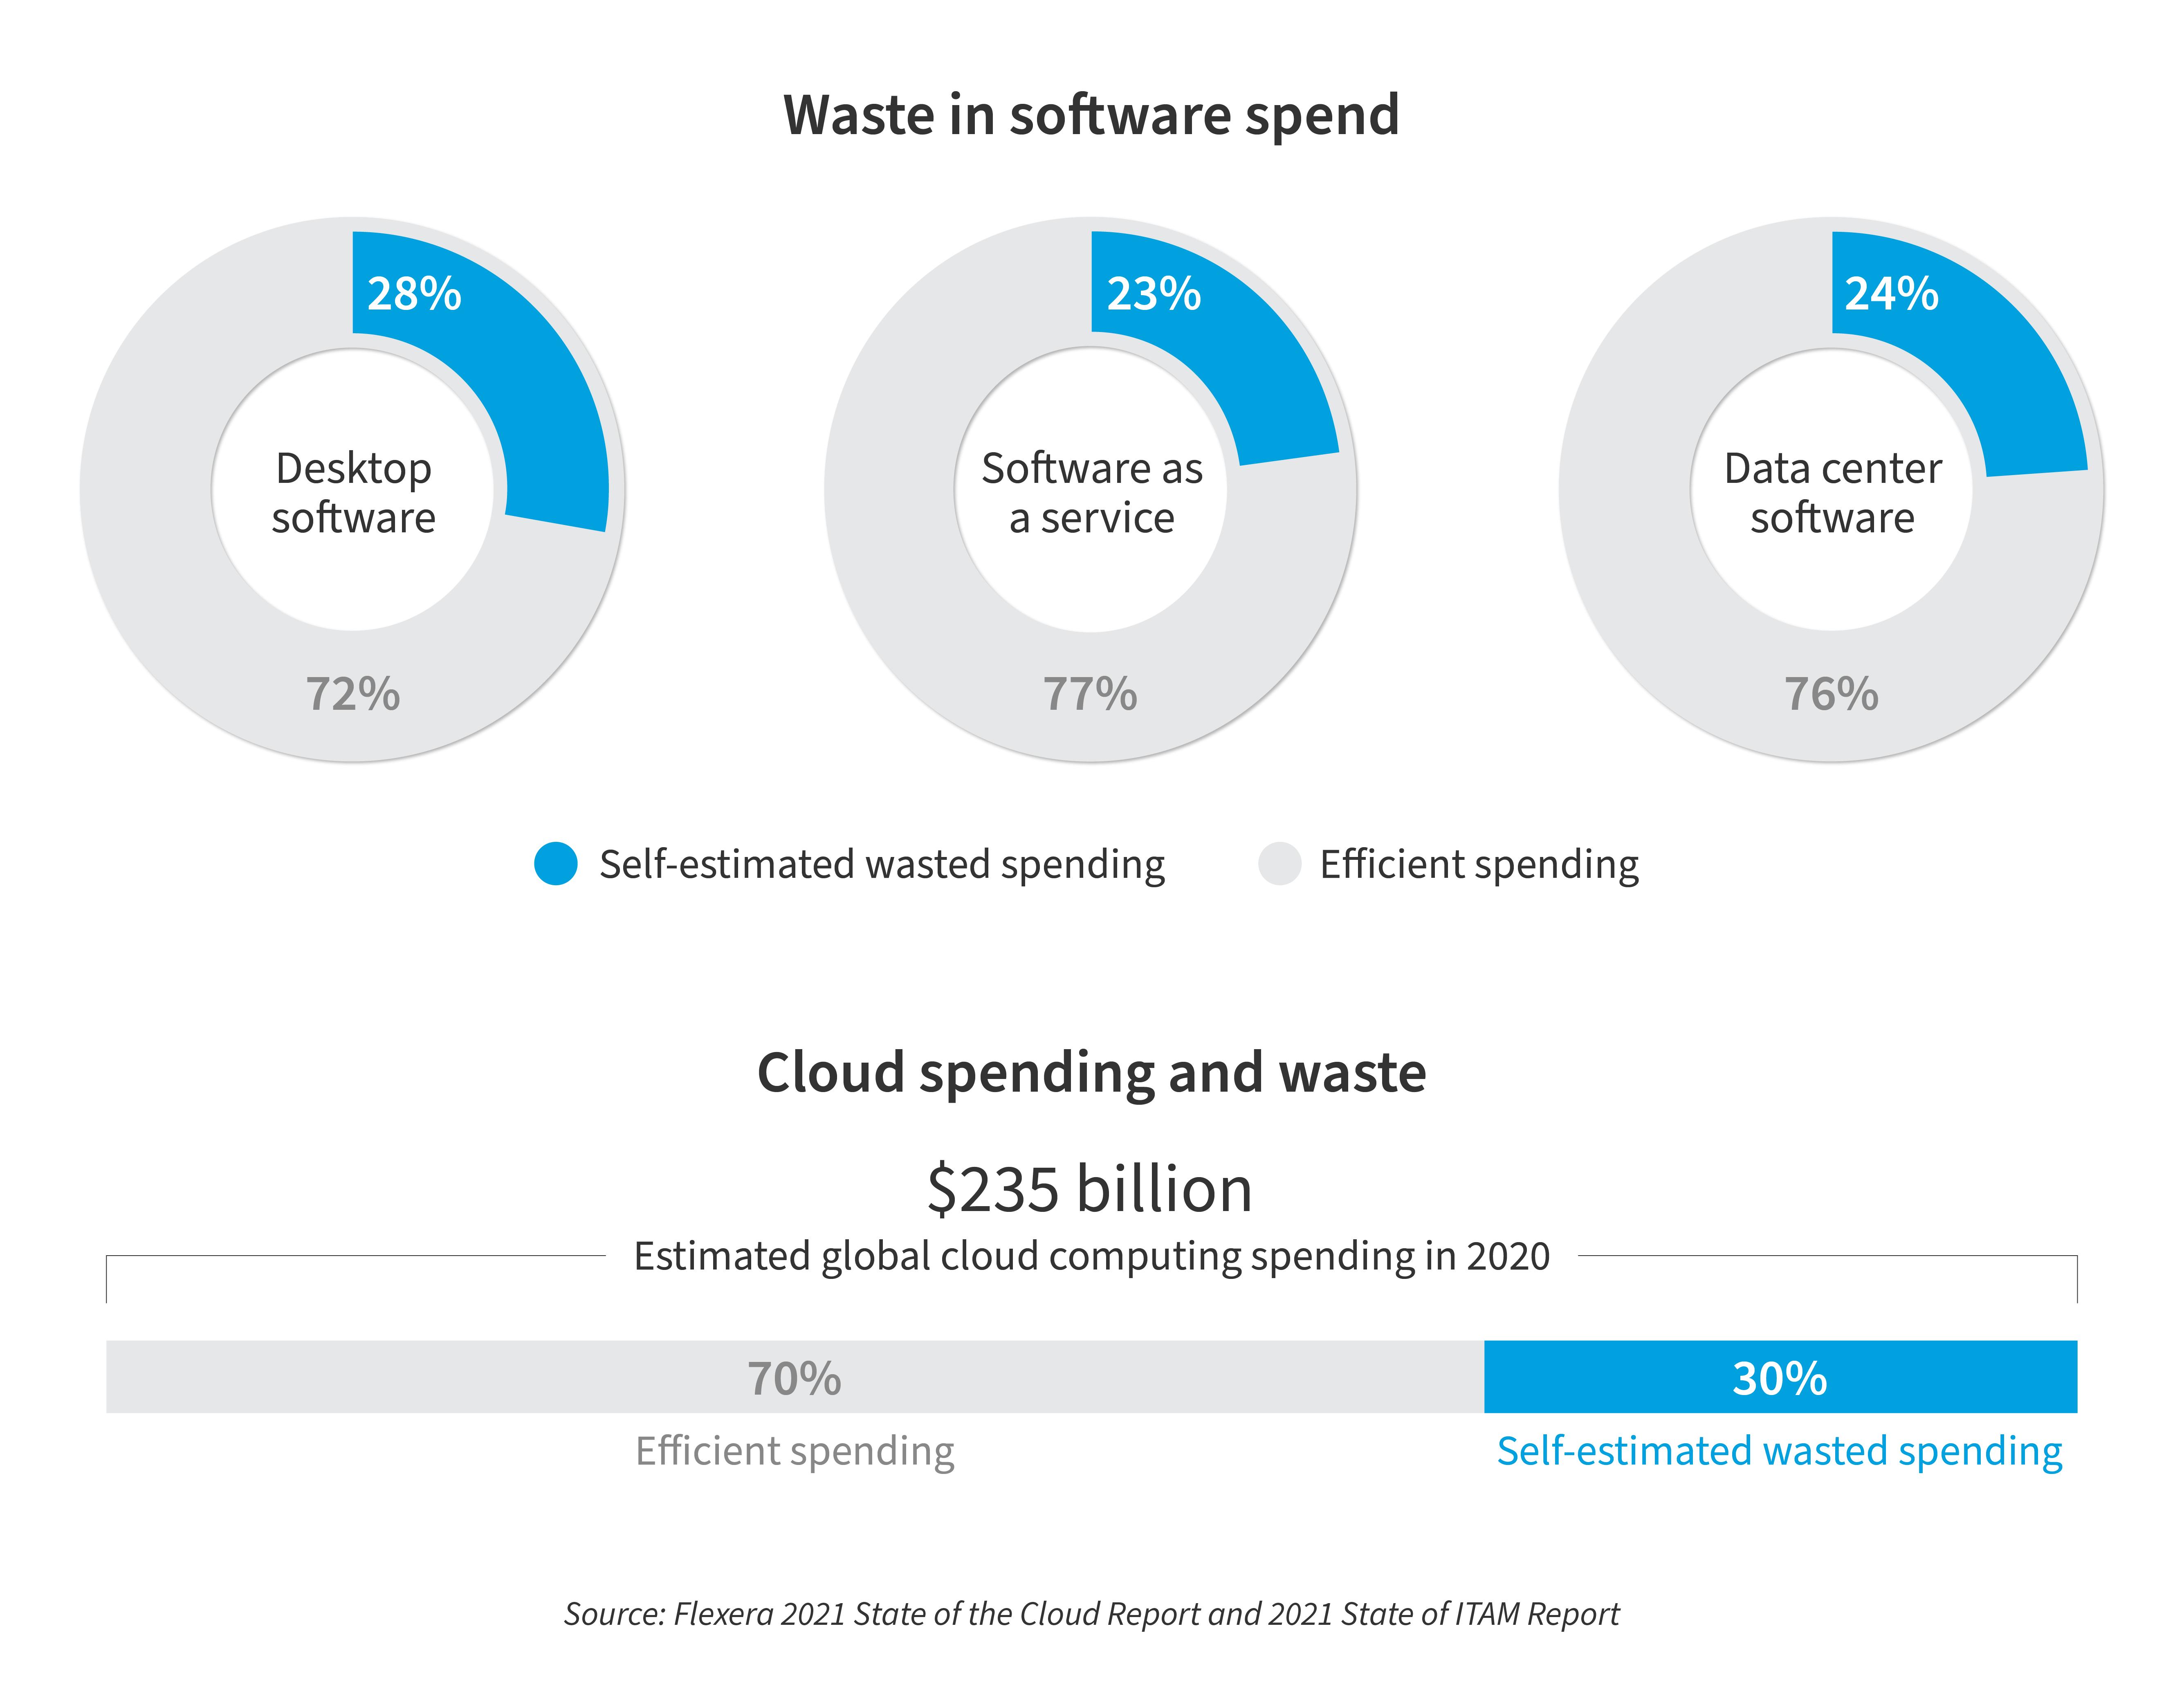 Waste in Software Spending